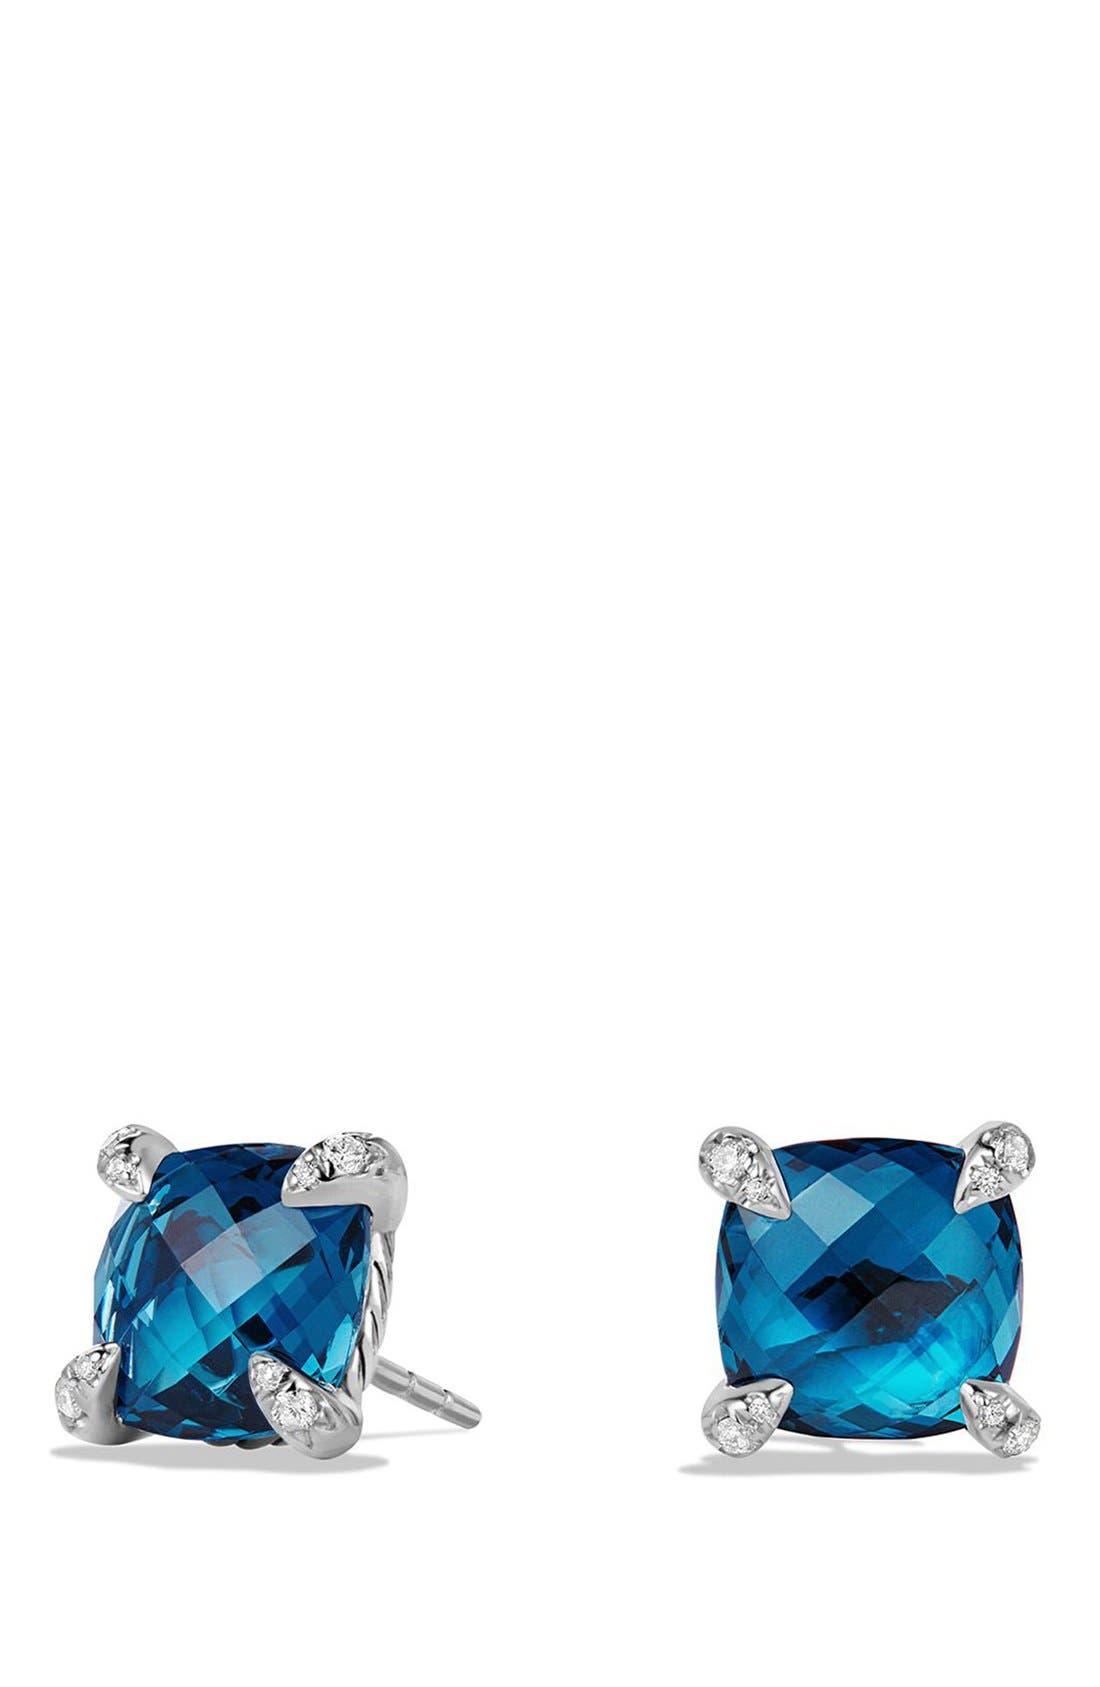 DAVID YURMAN Châtelaine Earrings with Semiprecious Stones and Diamonds